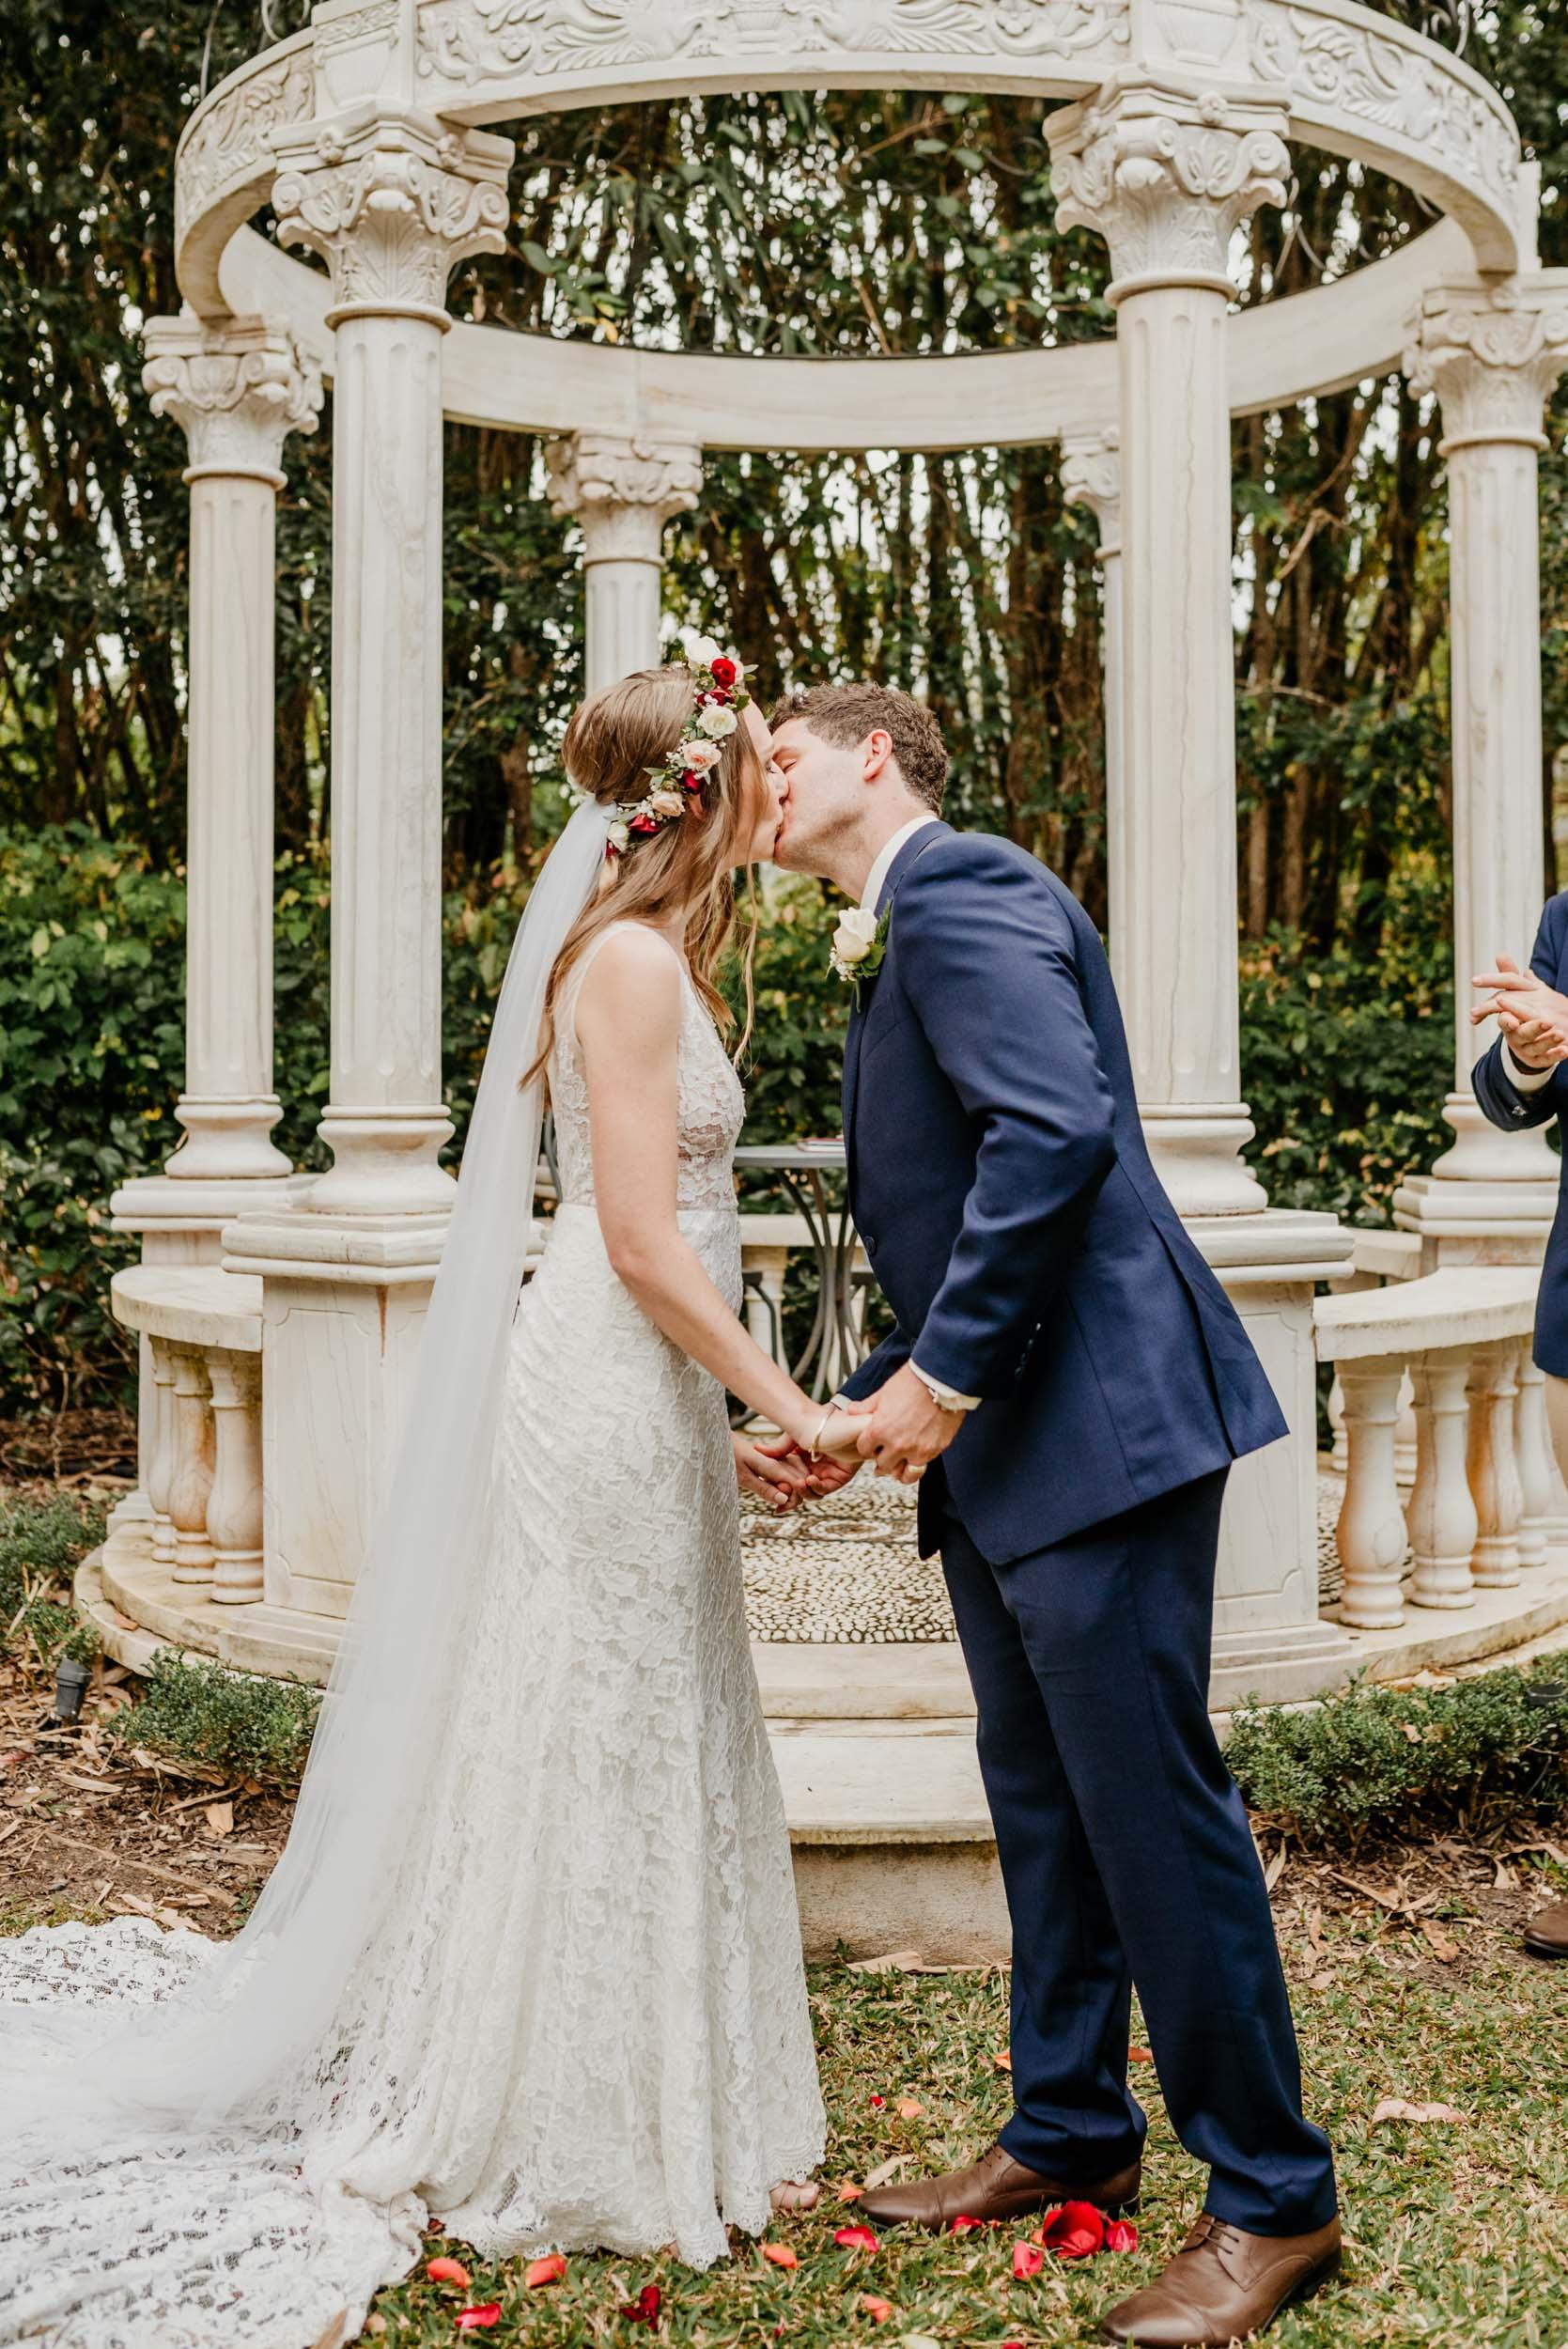 The Raw Photographer - Cairns Wedding Photographer - Laloli - Cairns Garden Ceremony - Cane Fields Photo Shoot-42.jpg